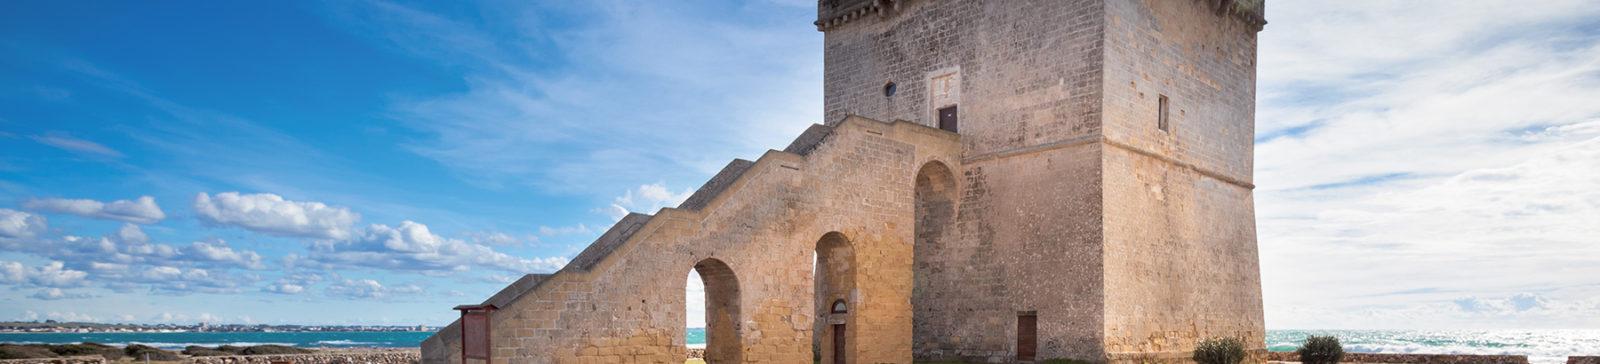 torre_lapillo_arneo